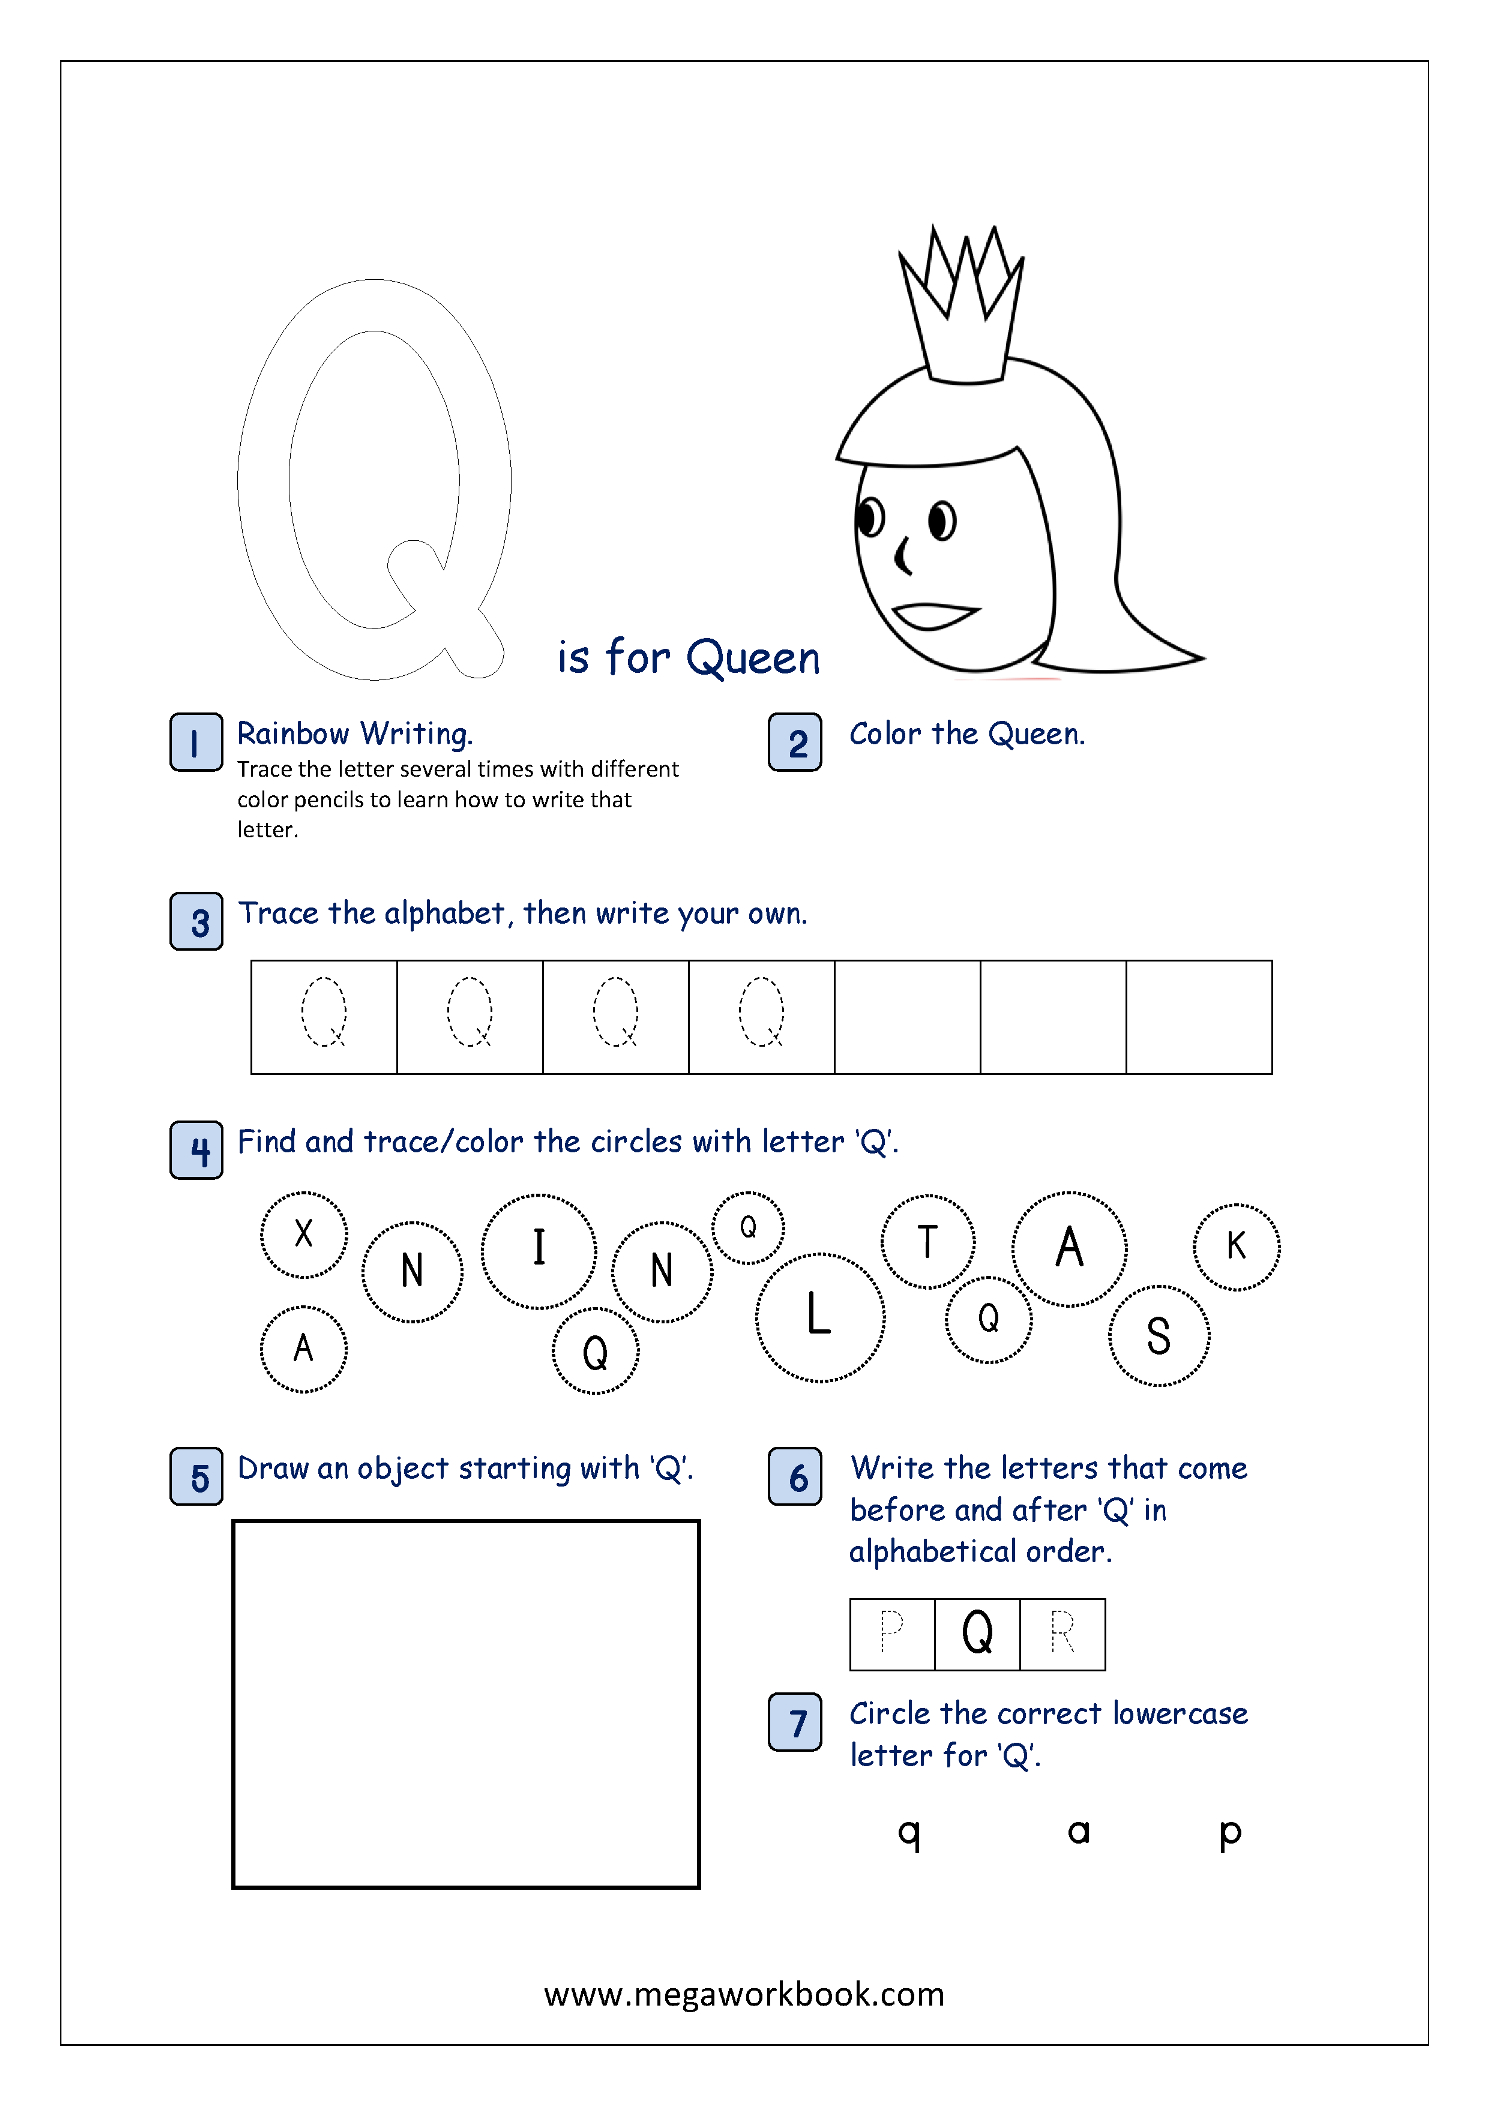 Alphabet Recognition Activity Worksheet - Capital Letter - Q for Tracing Letter Q Worksheets